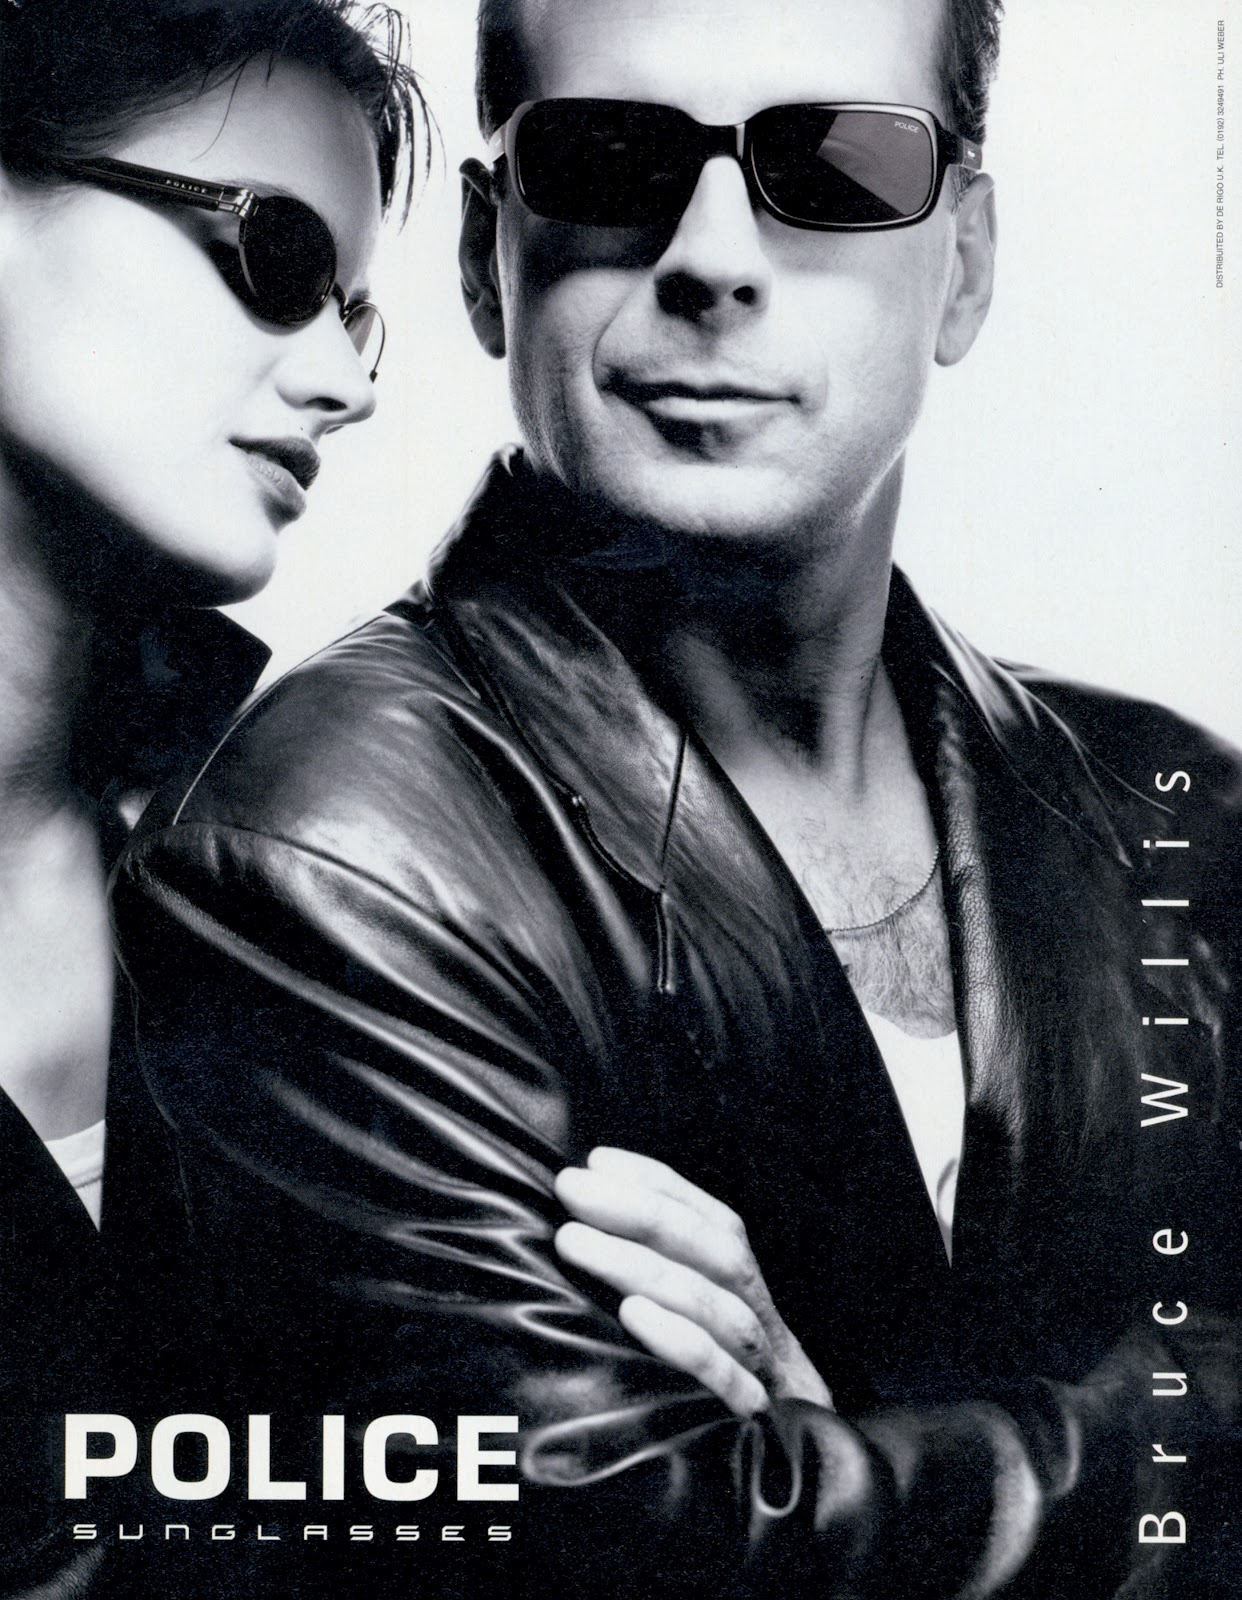 http://4.bp.blogspot.com/-bsTBvgdeDd0/UDqO1soBcII/AAAAAAAAJXI/afa6ap5gMYM/s1600/Police+Advertising+1999+Bruce+Willis.jpg